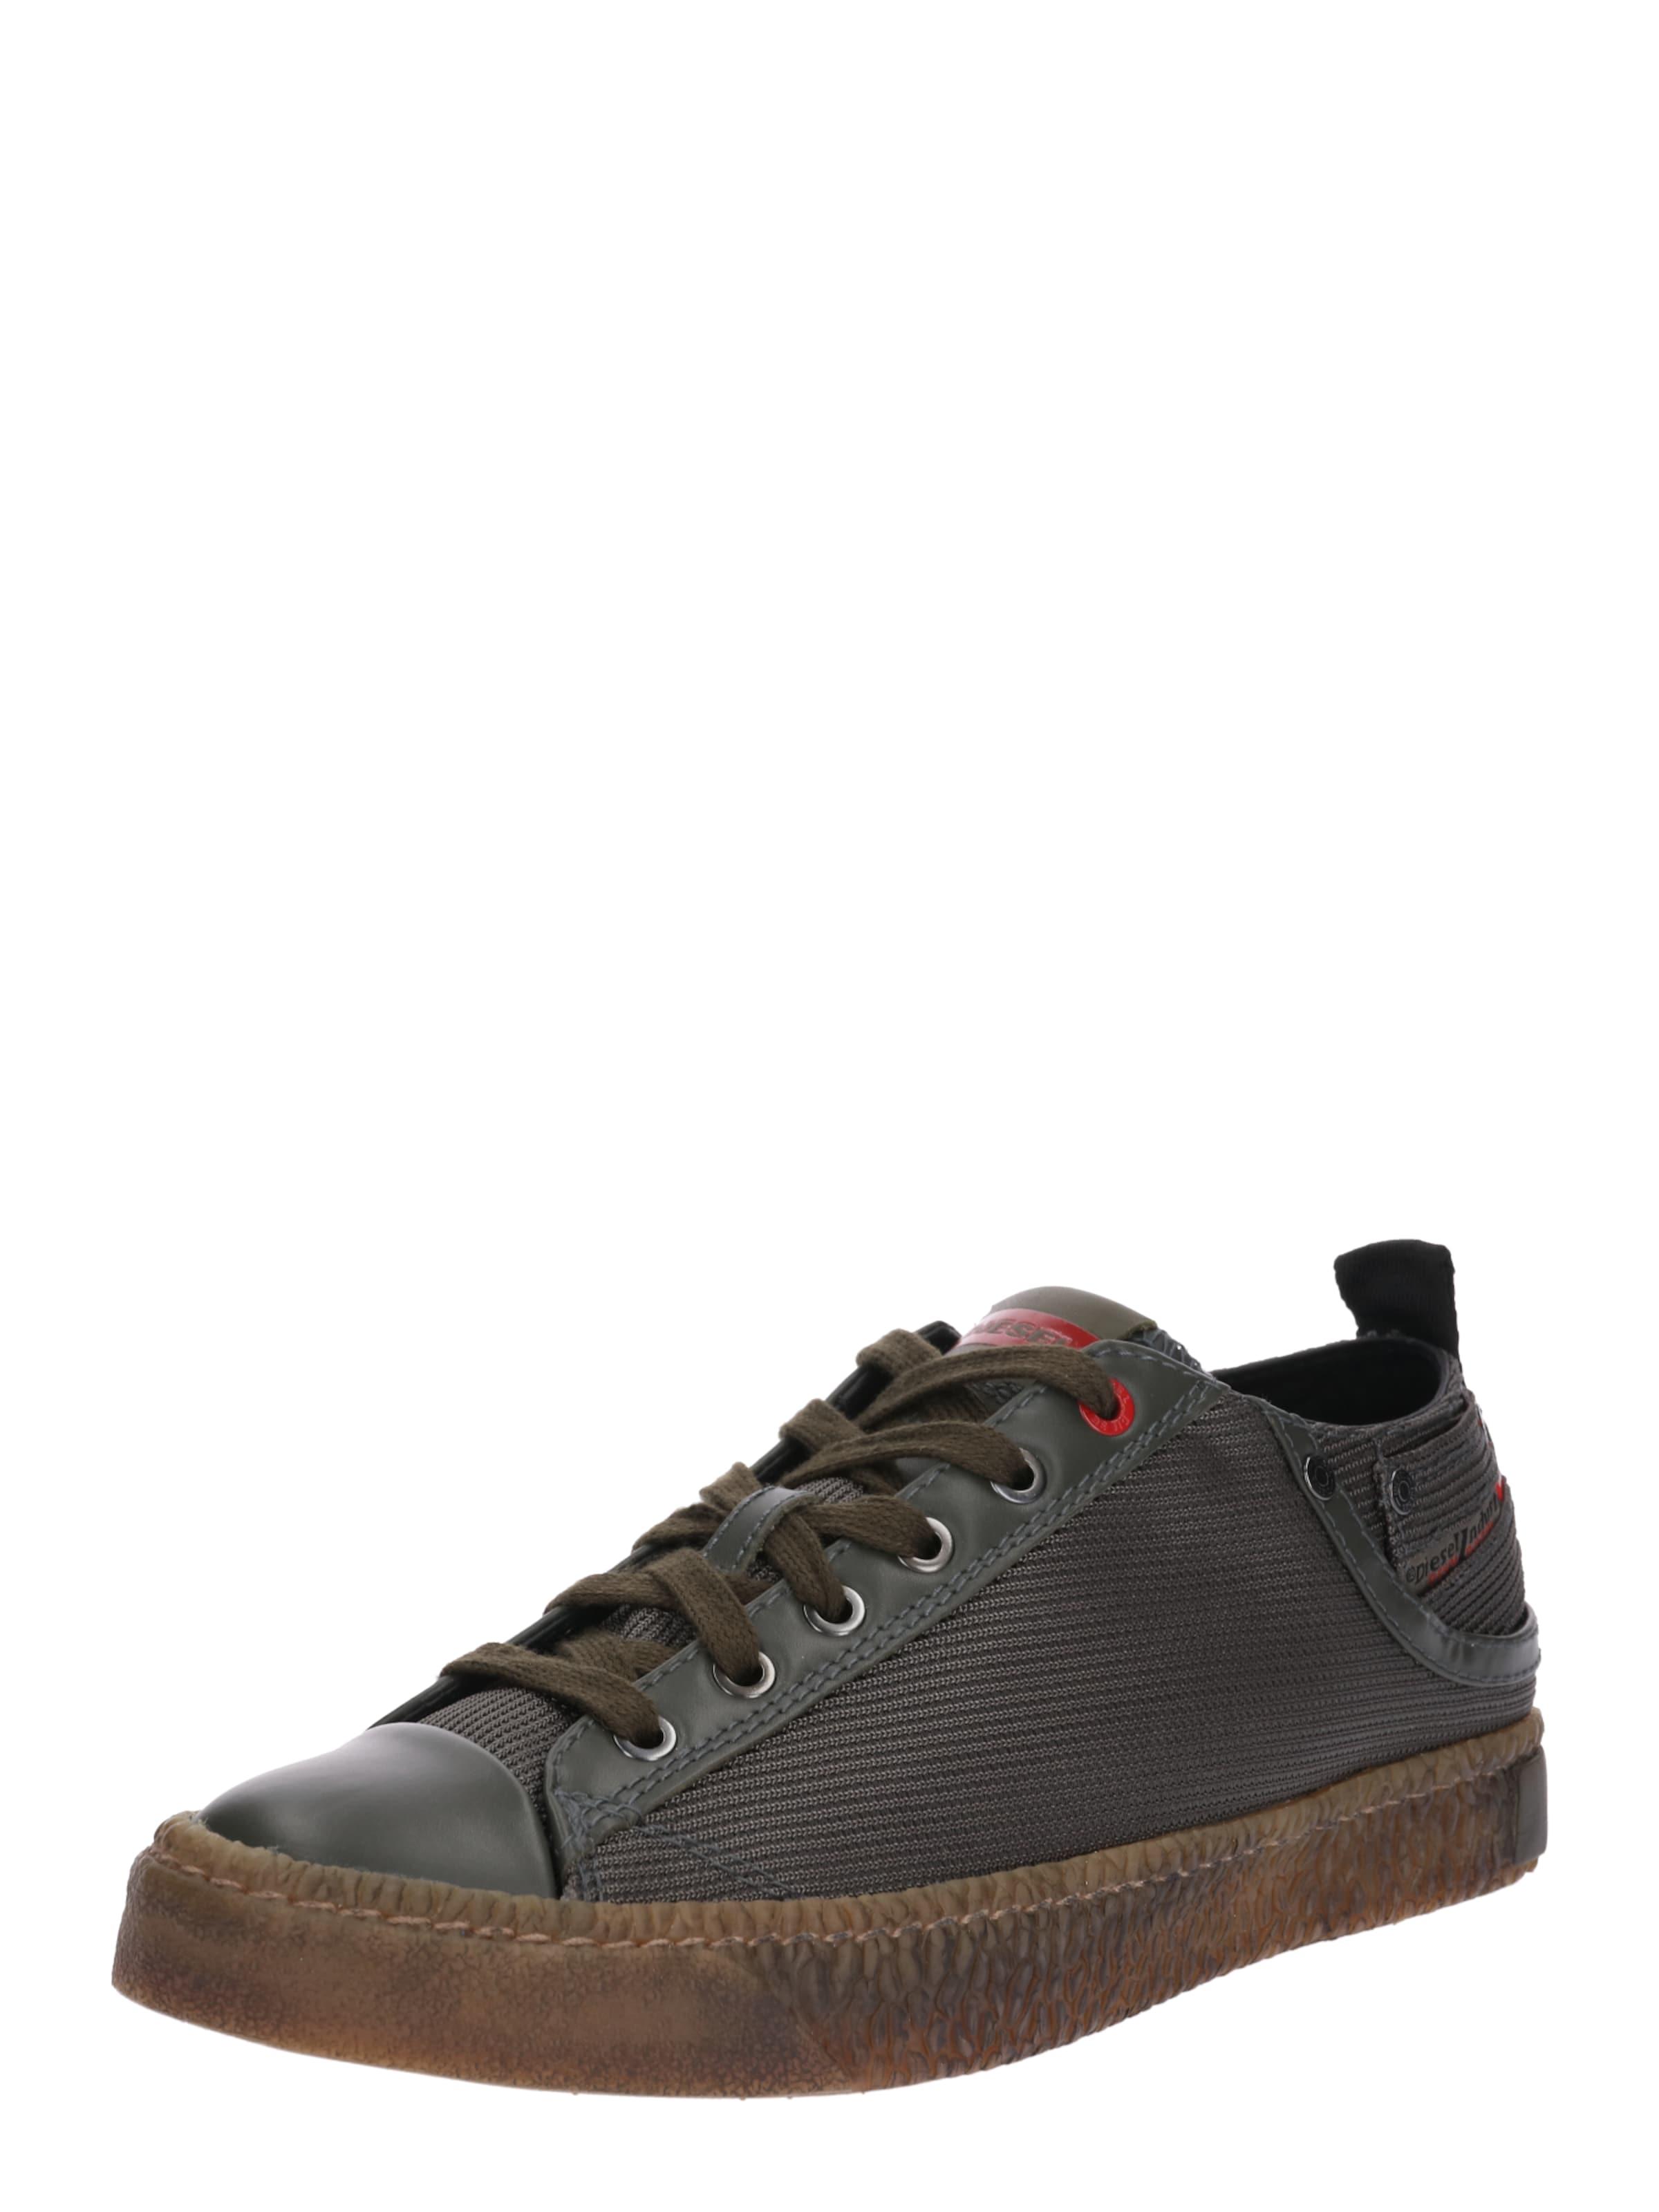 DIESEL Sneaker EXPOSURE LOW I Hohe Qualität